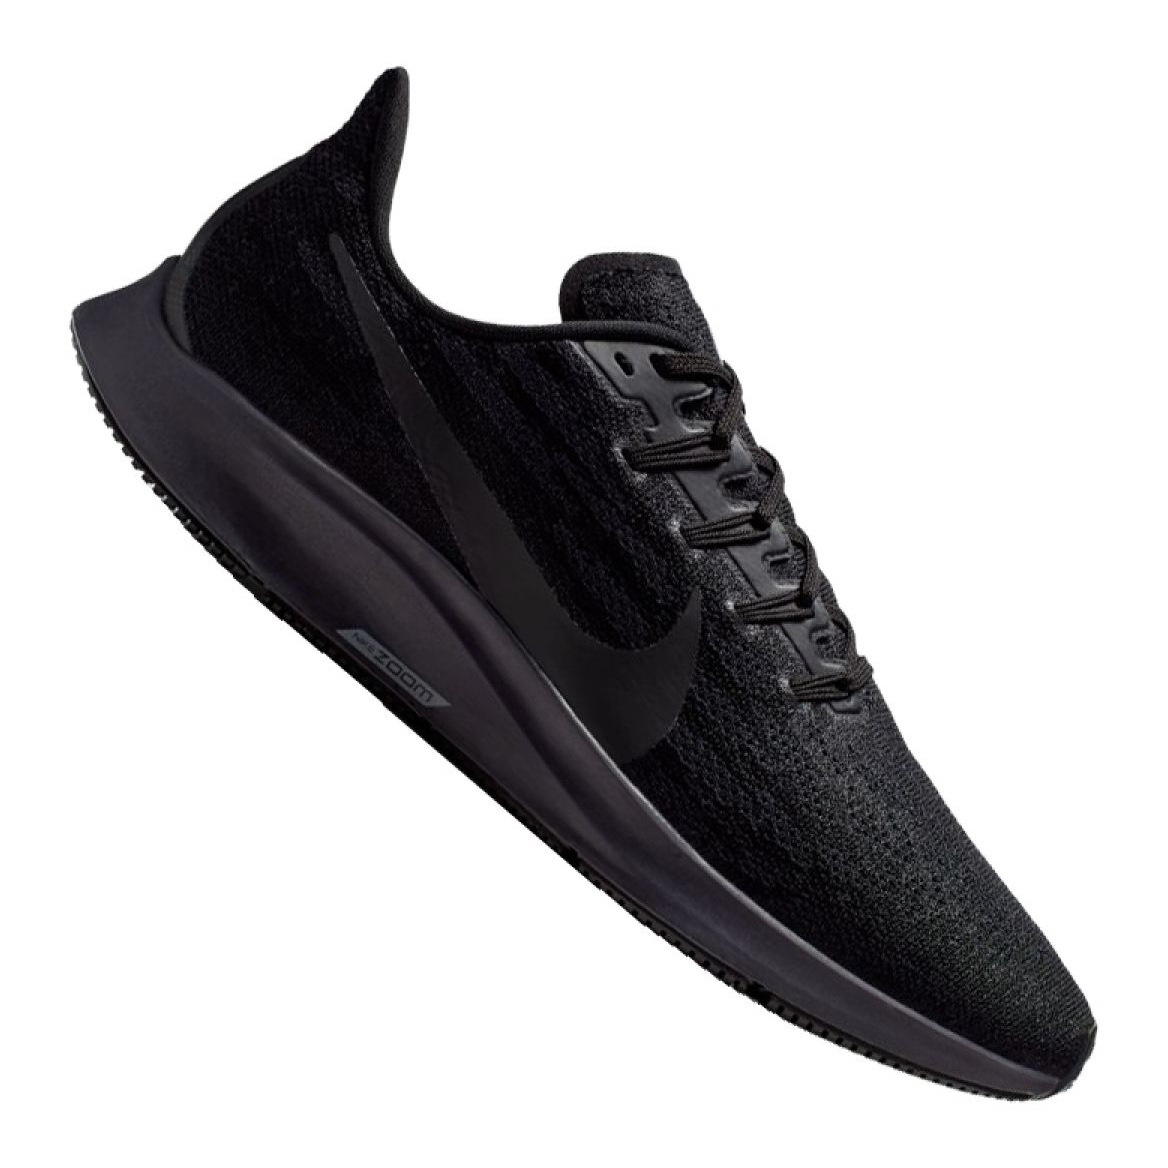 Zapatillas de running Nike Air Zoom Pegasus 36 M AQ2203 006 negro